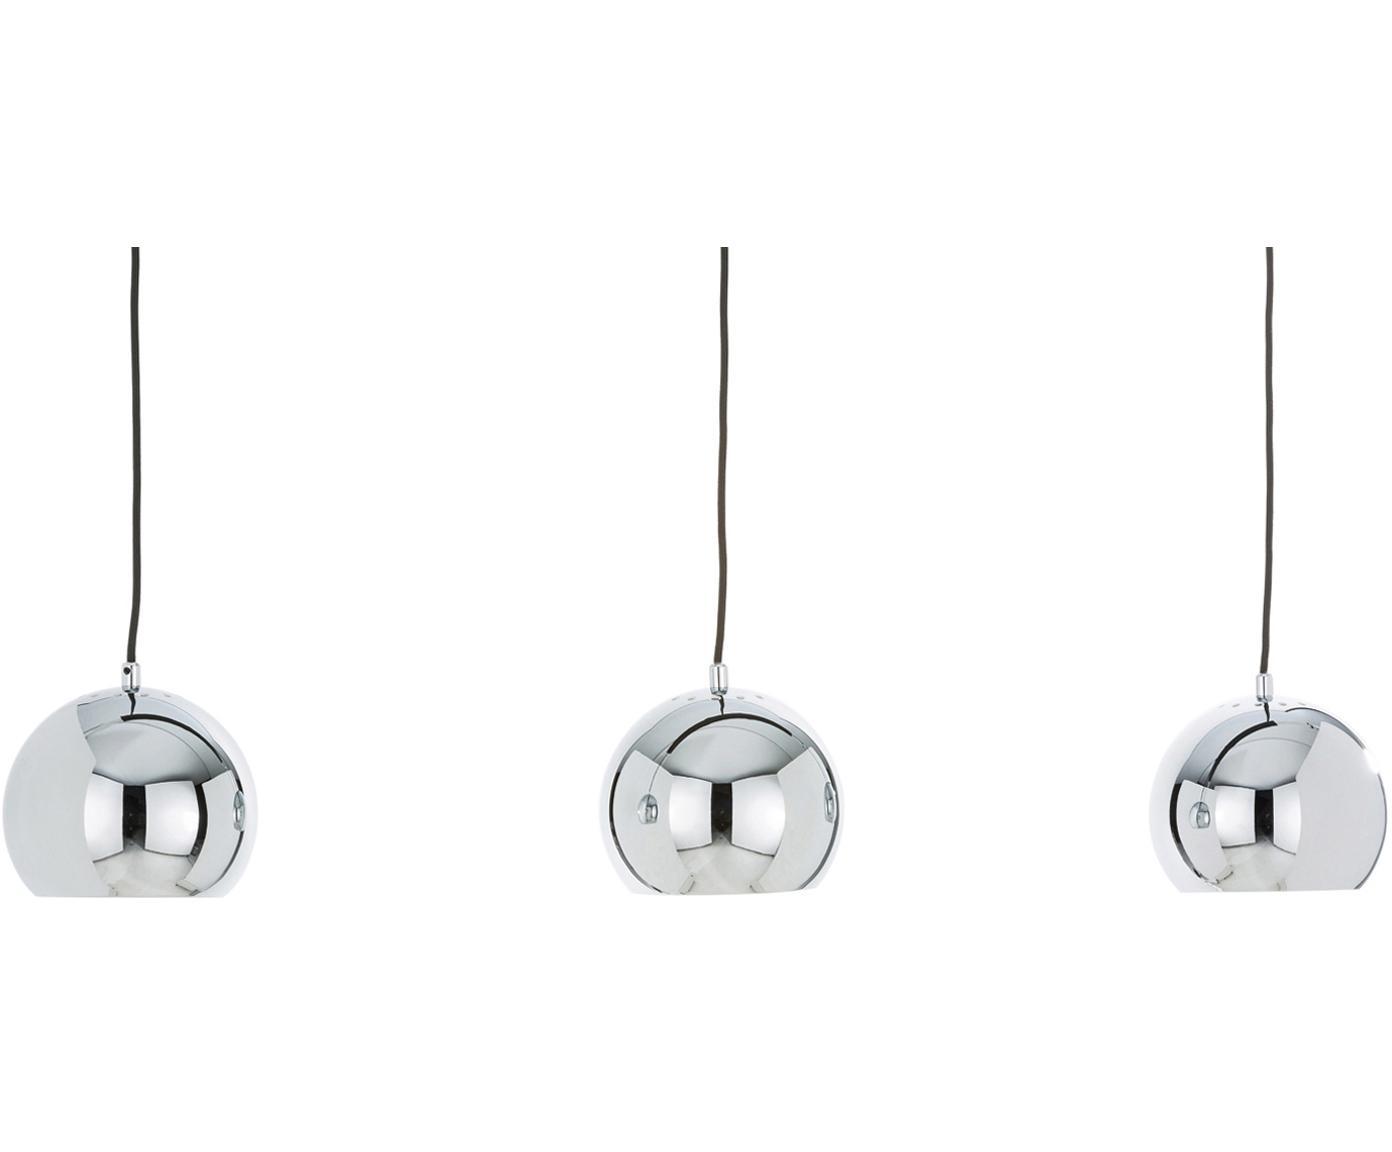 Lámpara de techo Ball, Anclaje: metal pintado, Cromo brillante, negro mate, An 100 x Al 168 cm